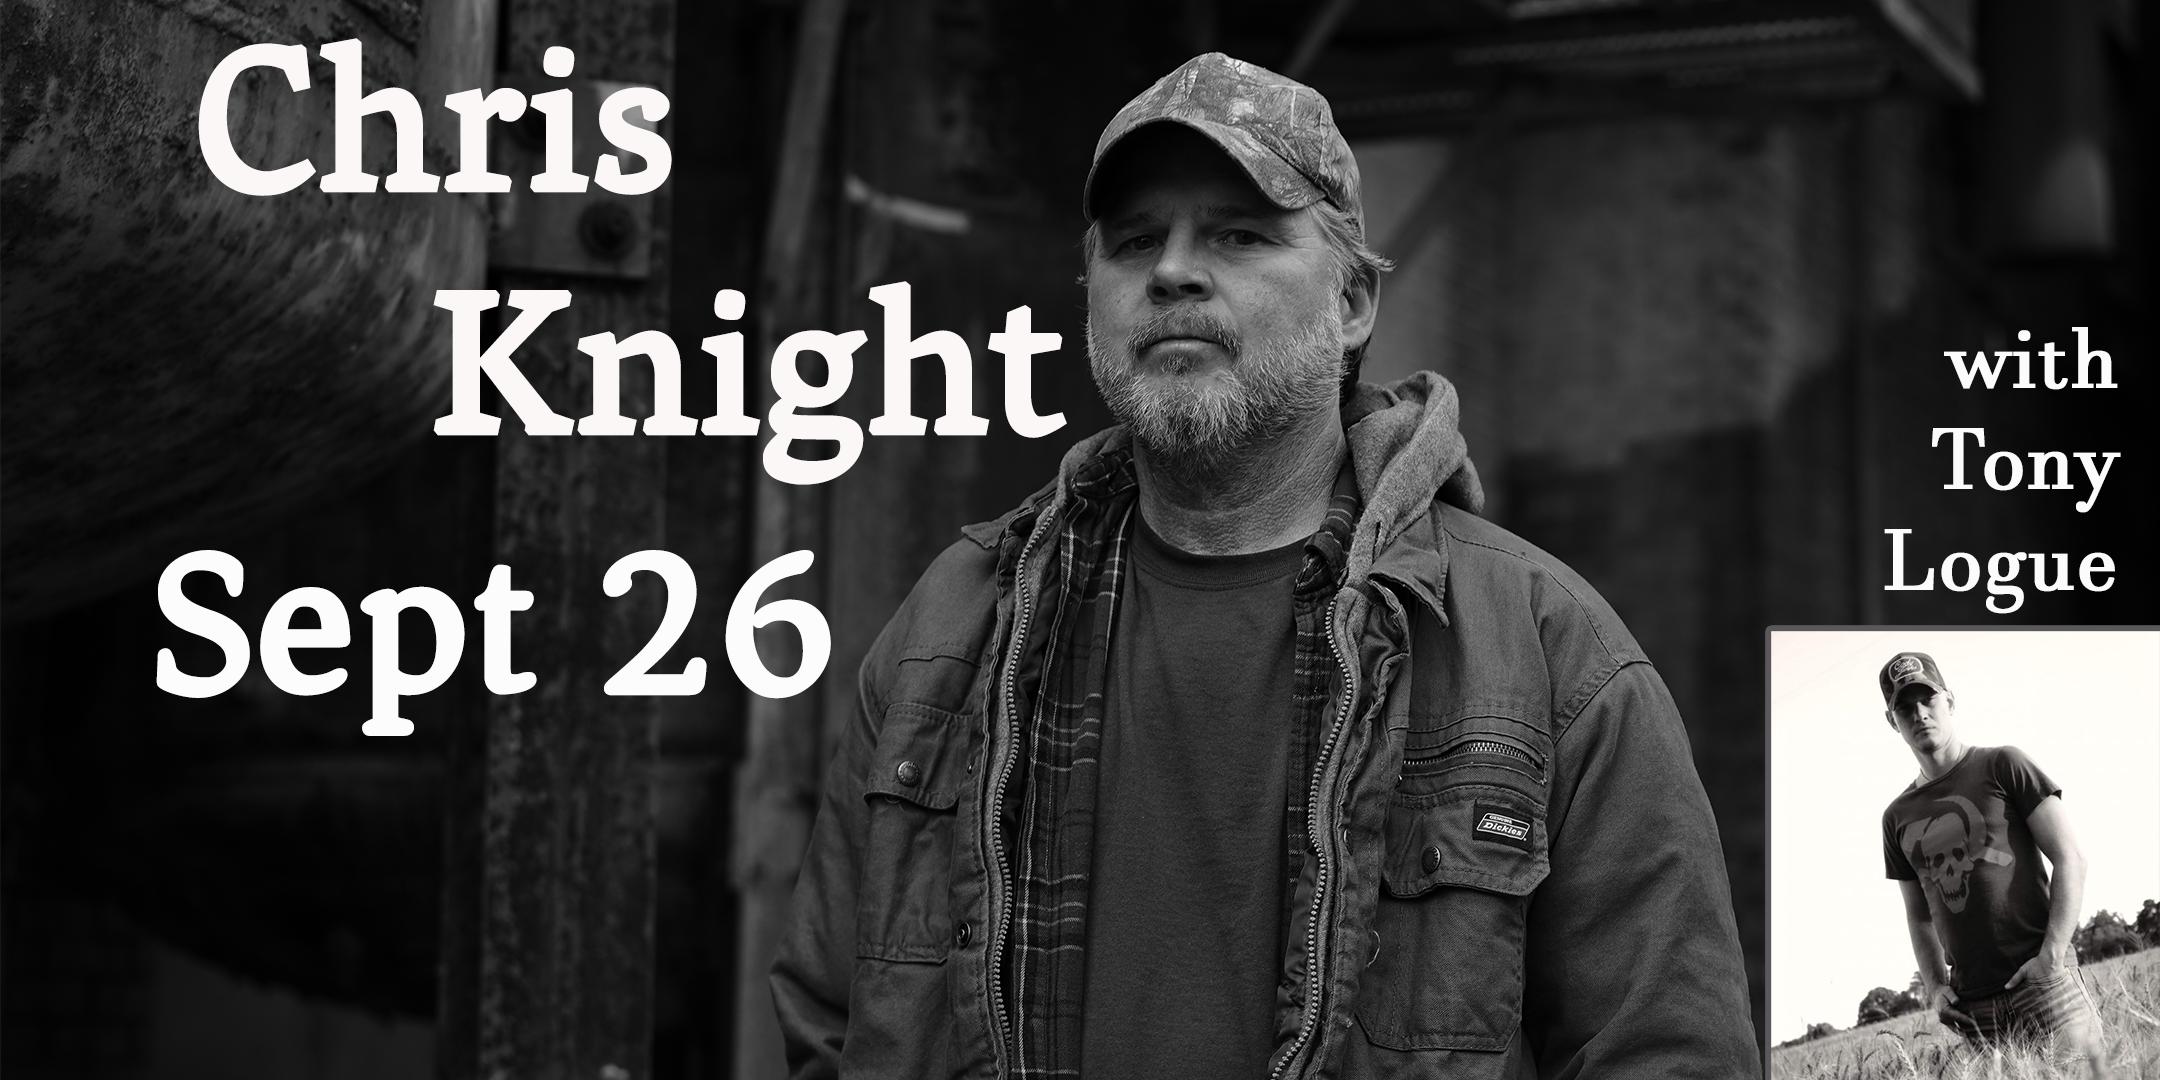 Chris Knight - Sept 26